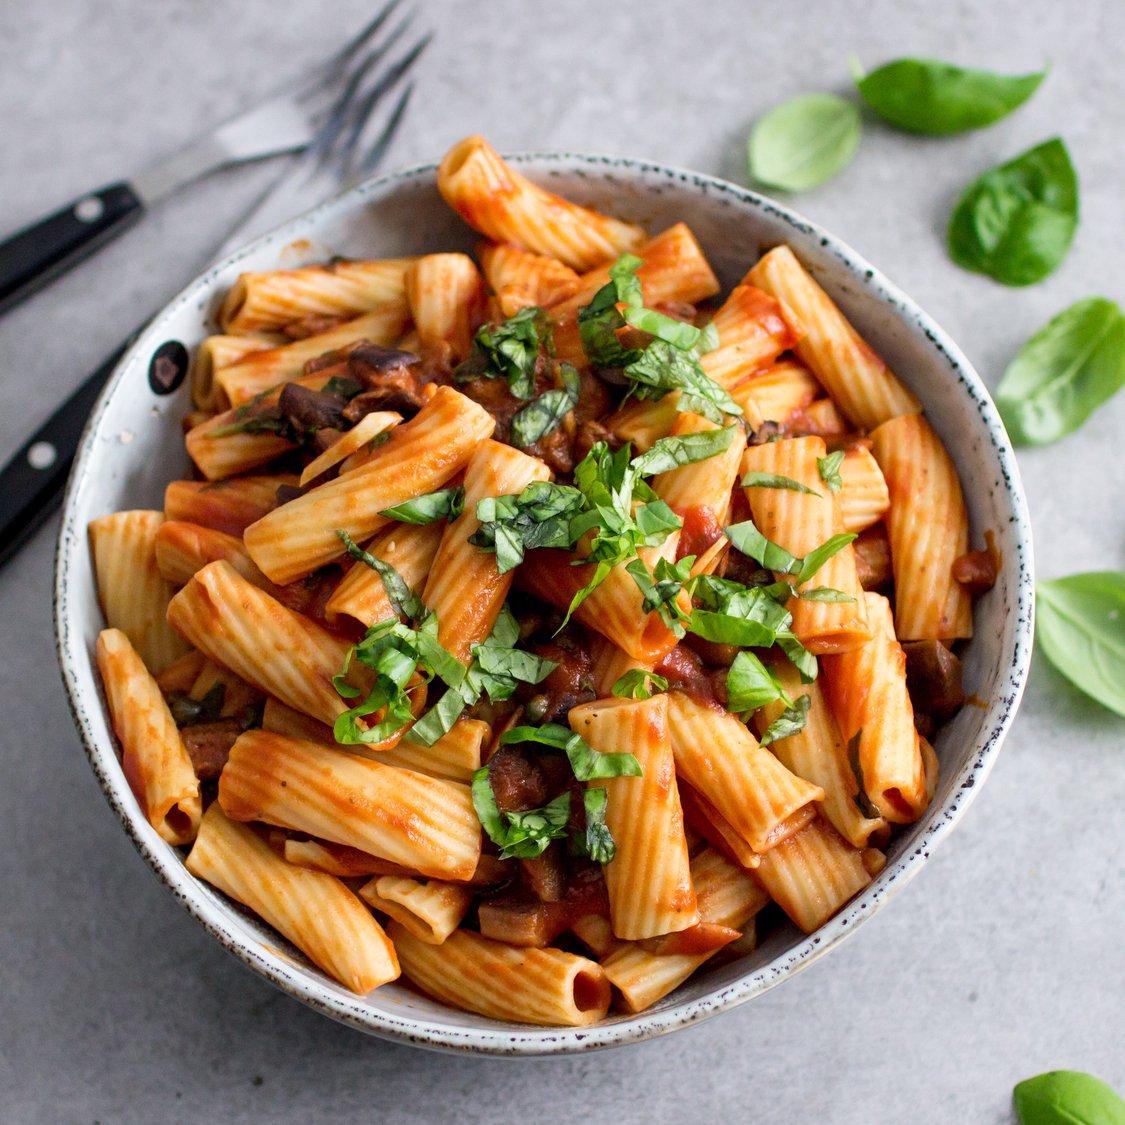 Rigatoni mit Tomaten-Aubergine-Soße